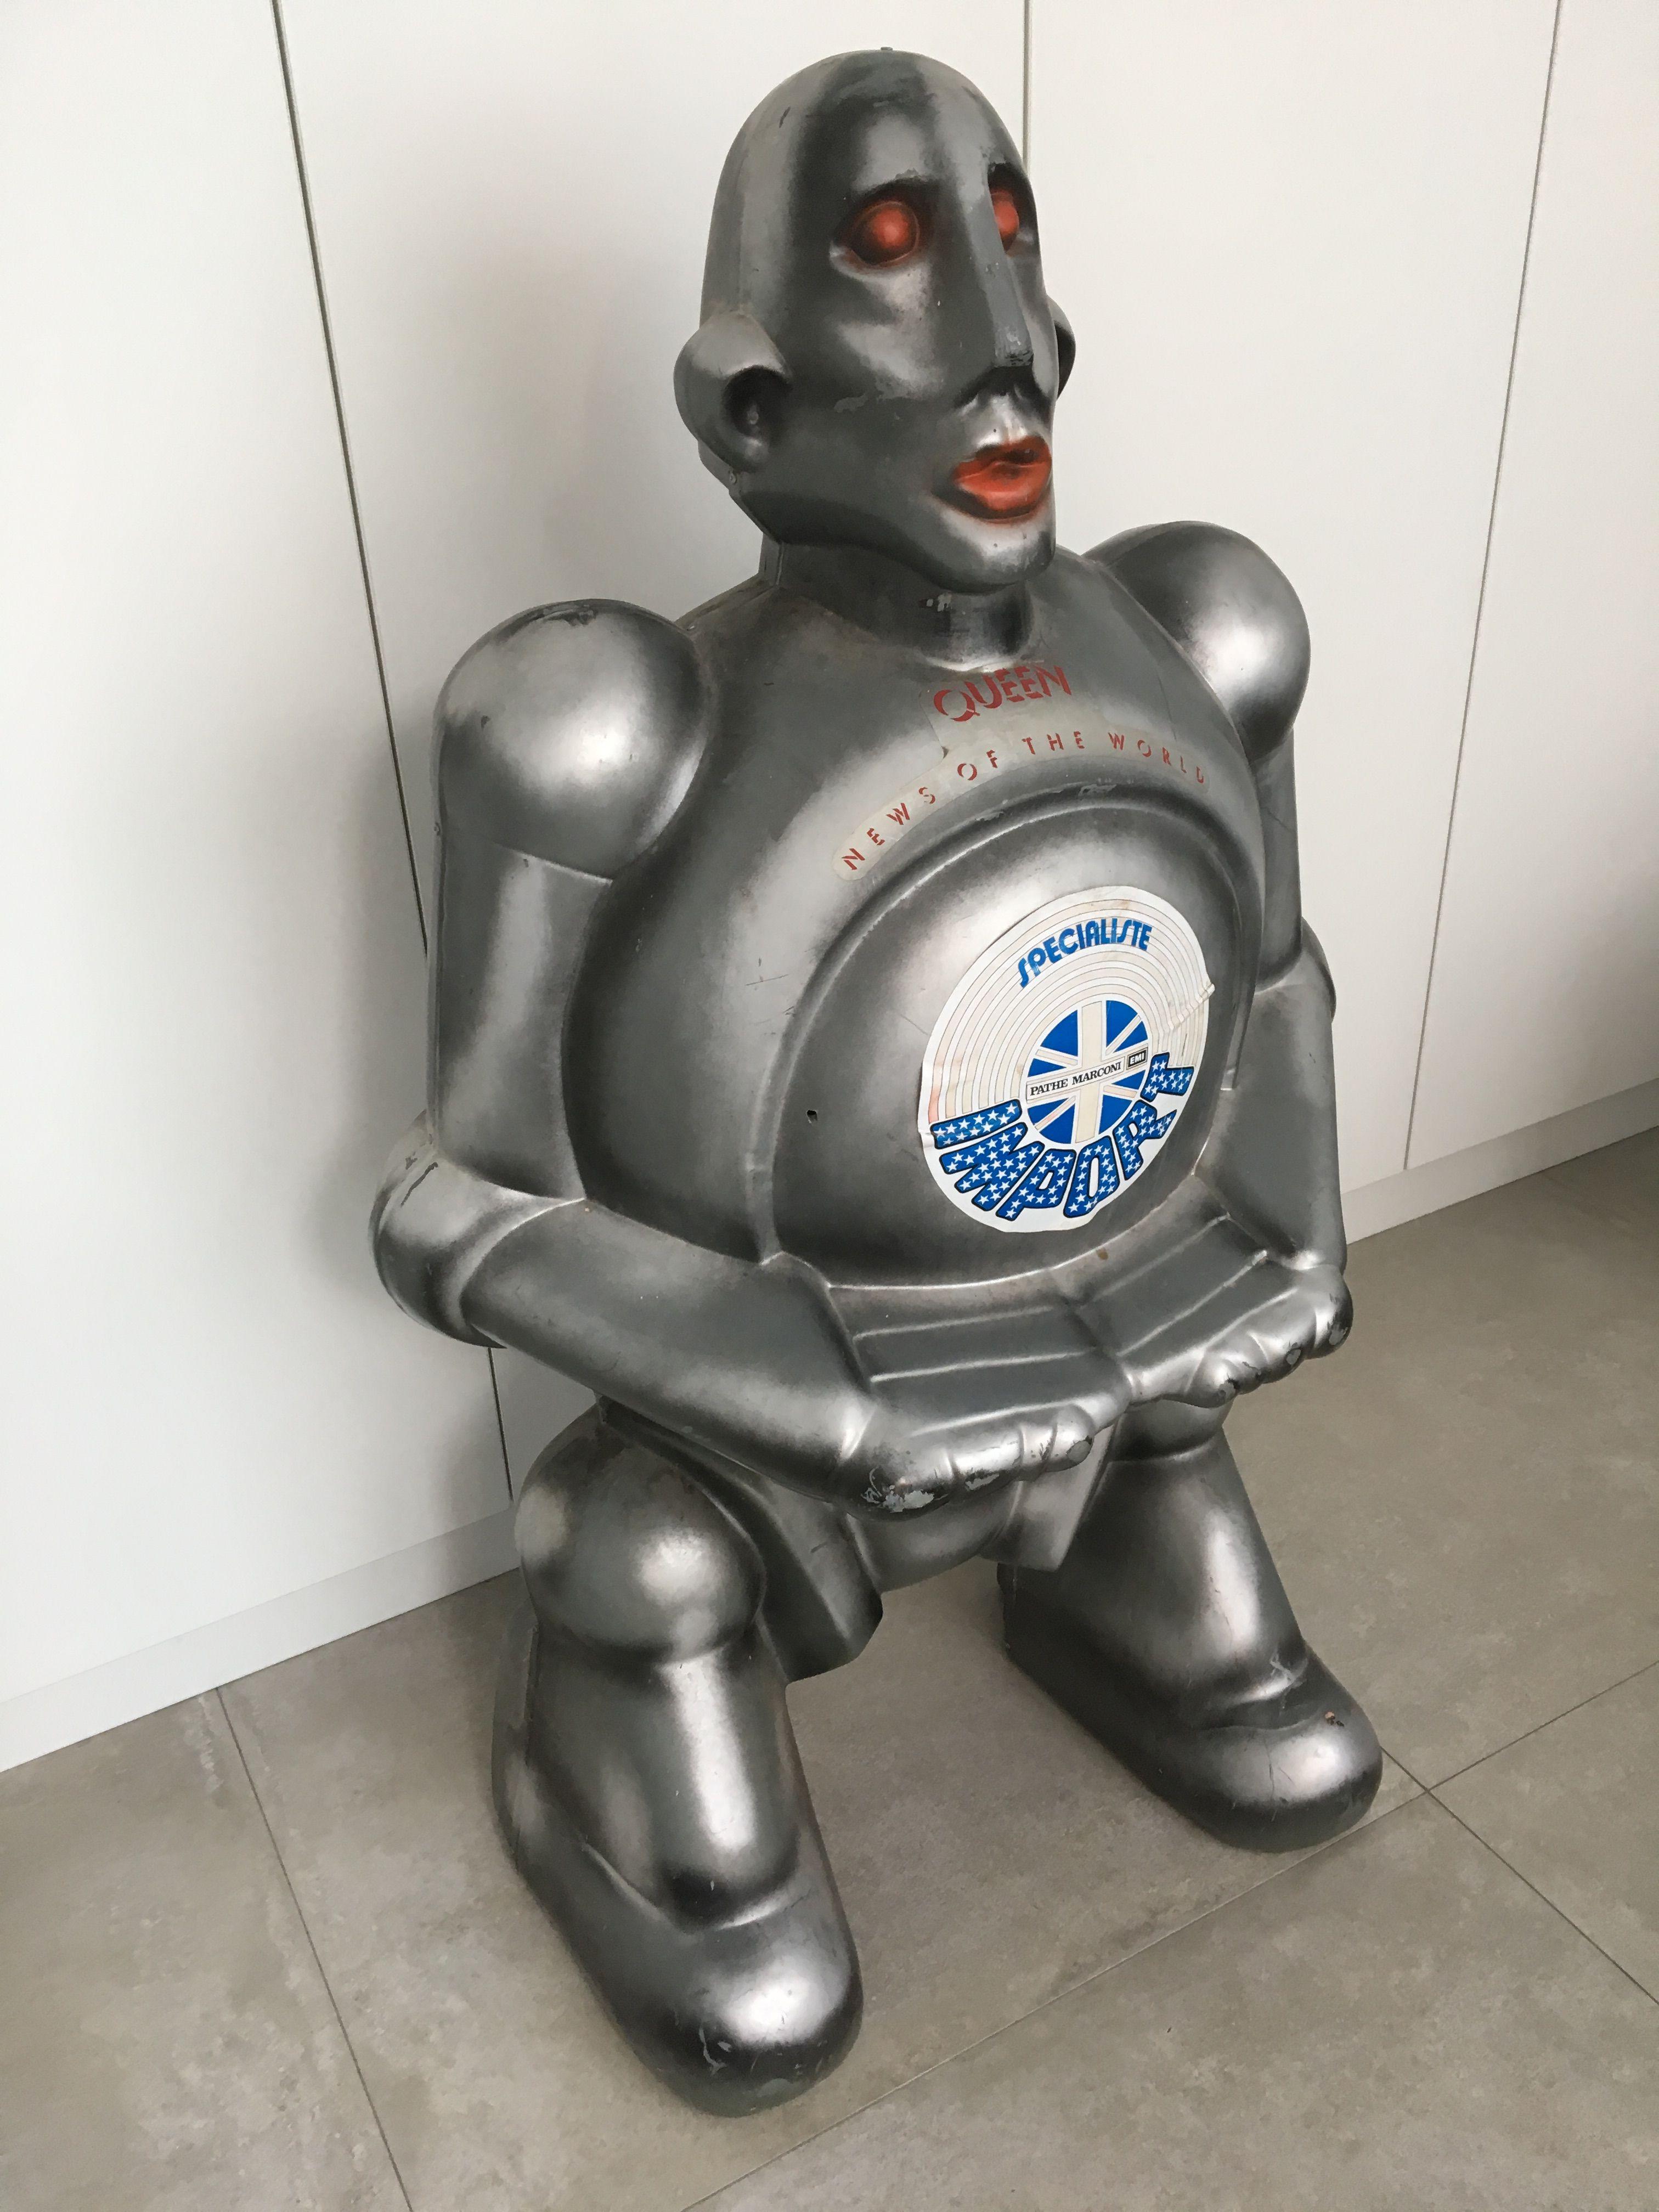 Queen News of the World promo Robot!!! | Queen Pins